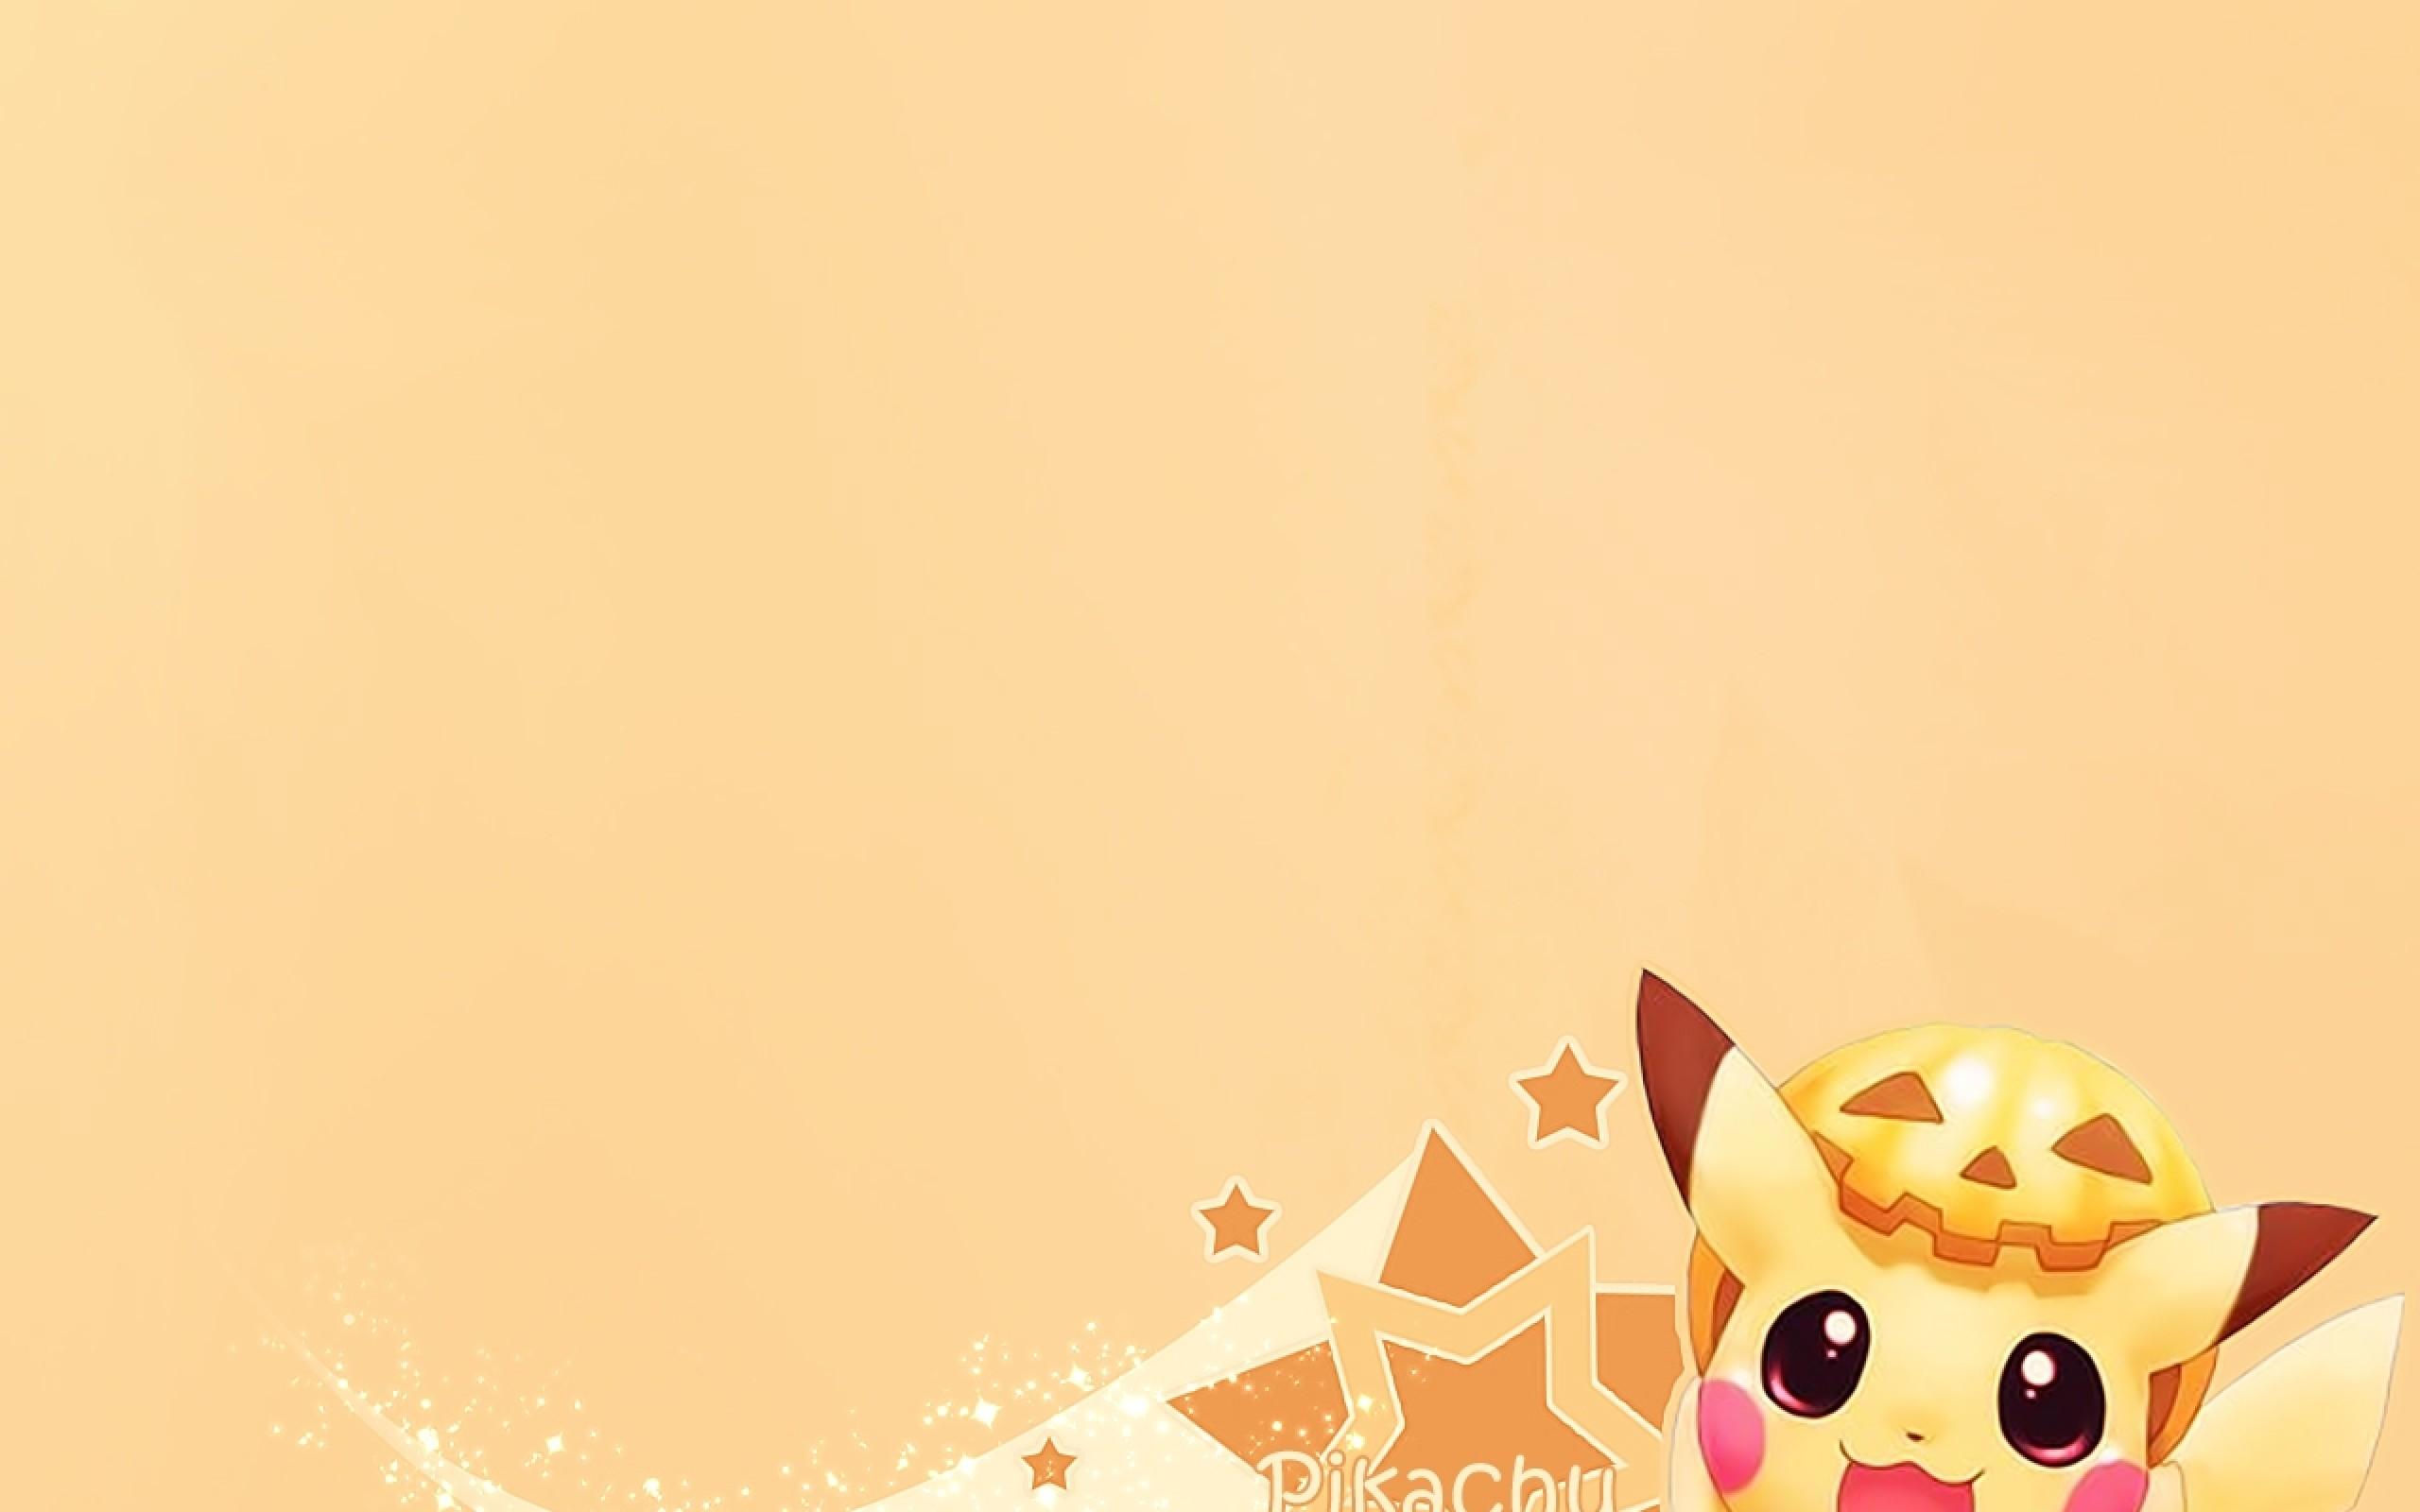 Full HD Cute Pikachu Pokemon Wallpapers